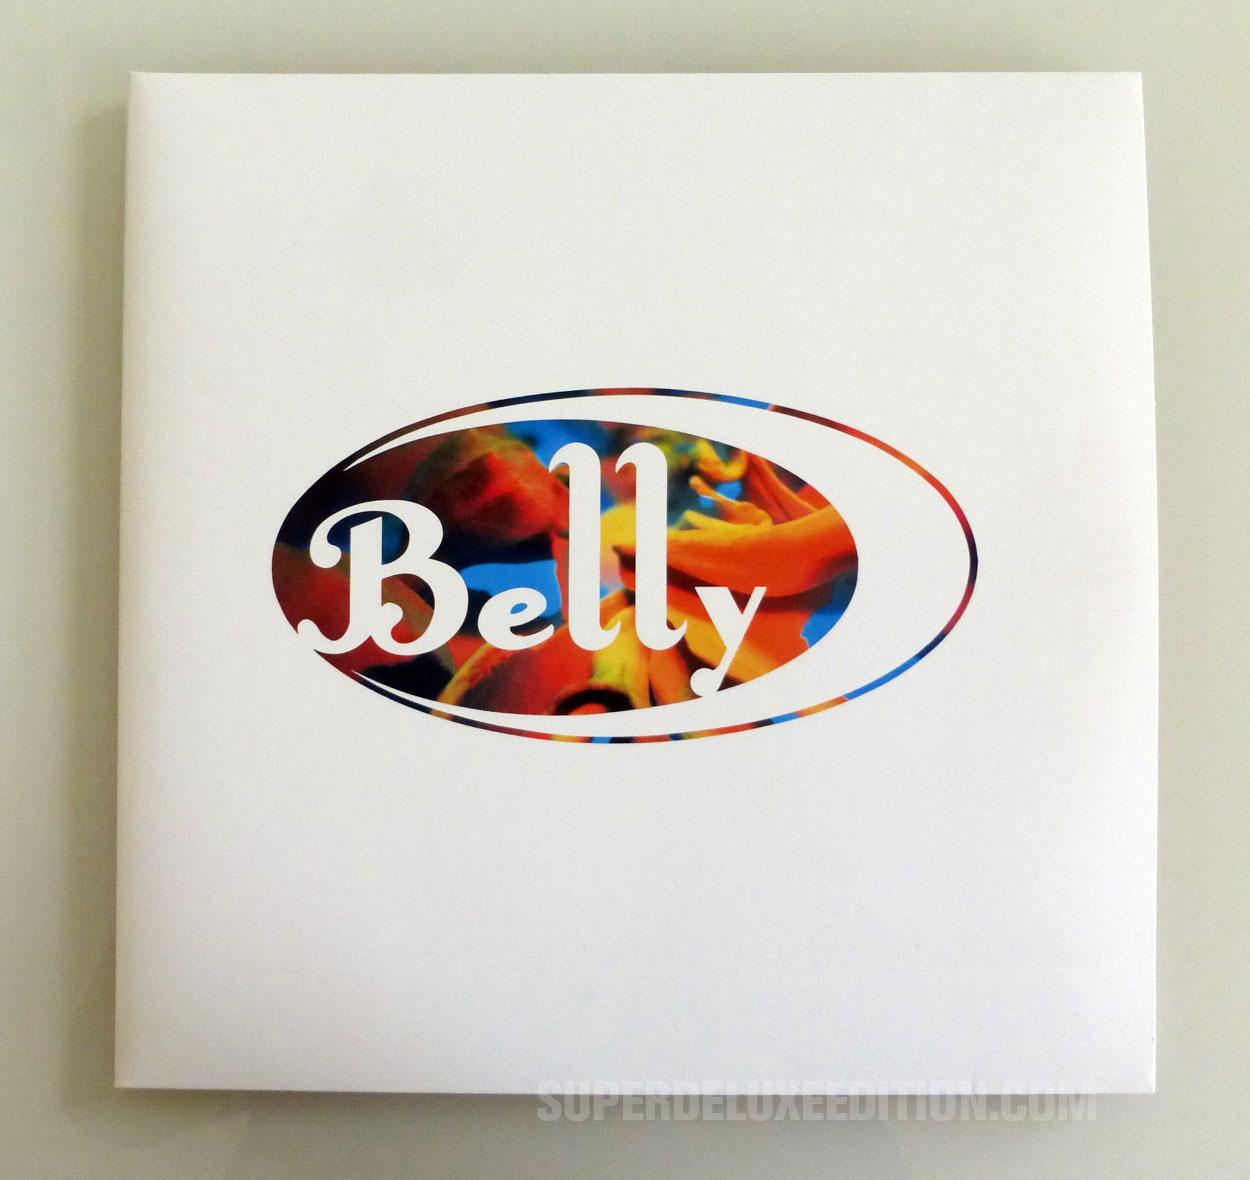 Belly / Star 2LP gatefold white marbled vinyl edition